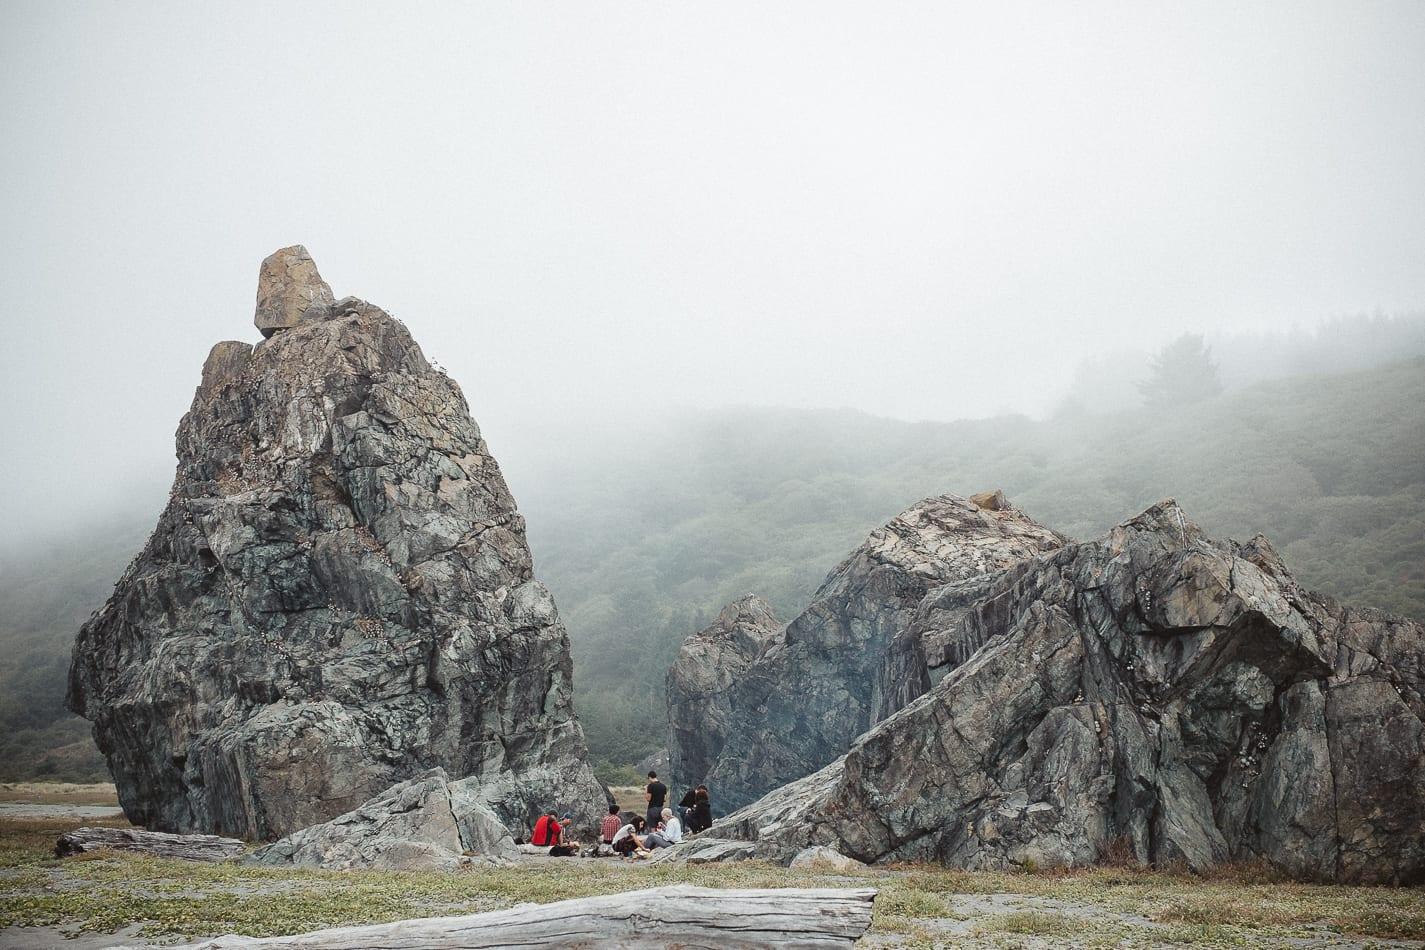 patricks-point-beach-camping-california-adventure-photographer-1